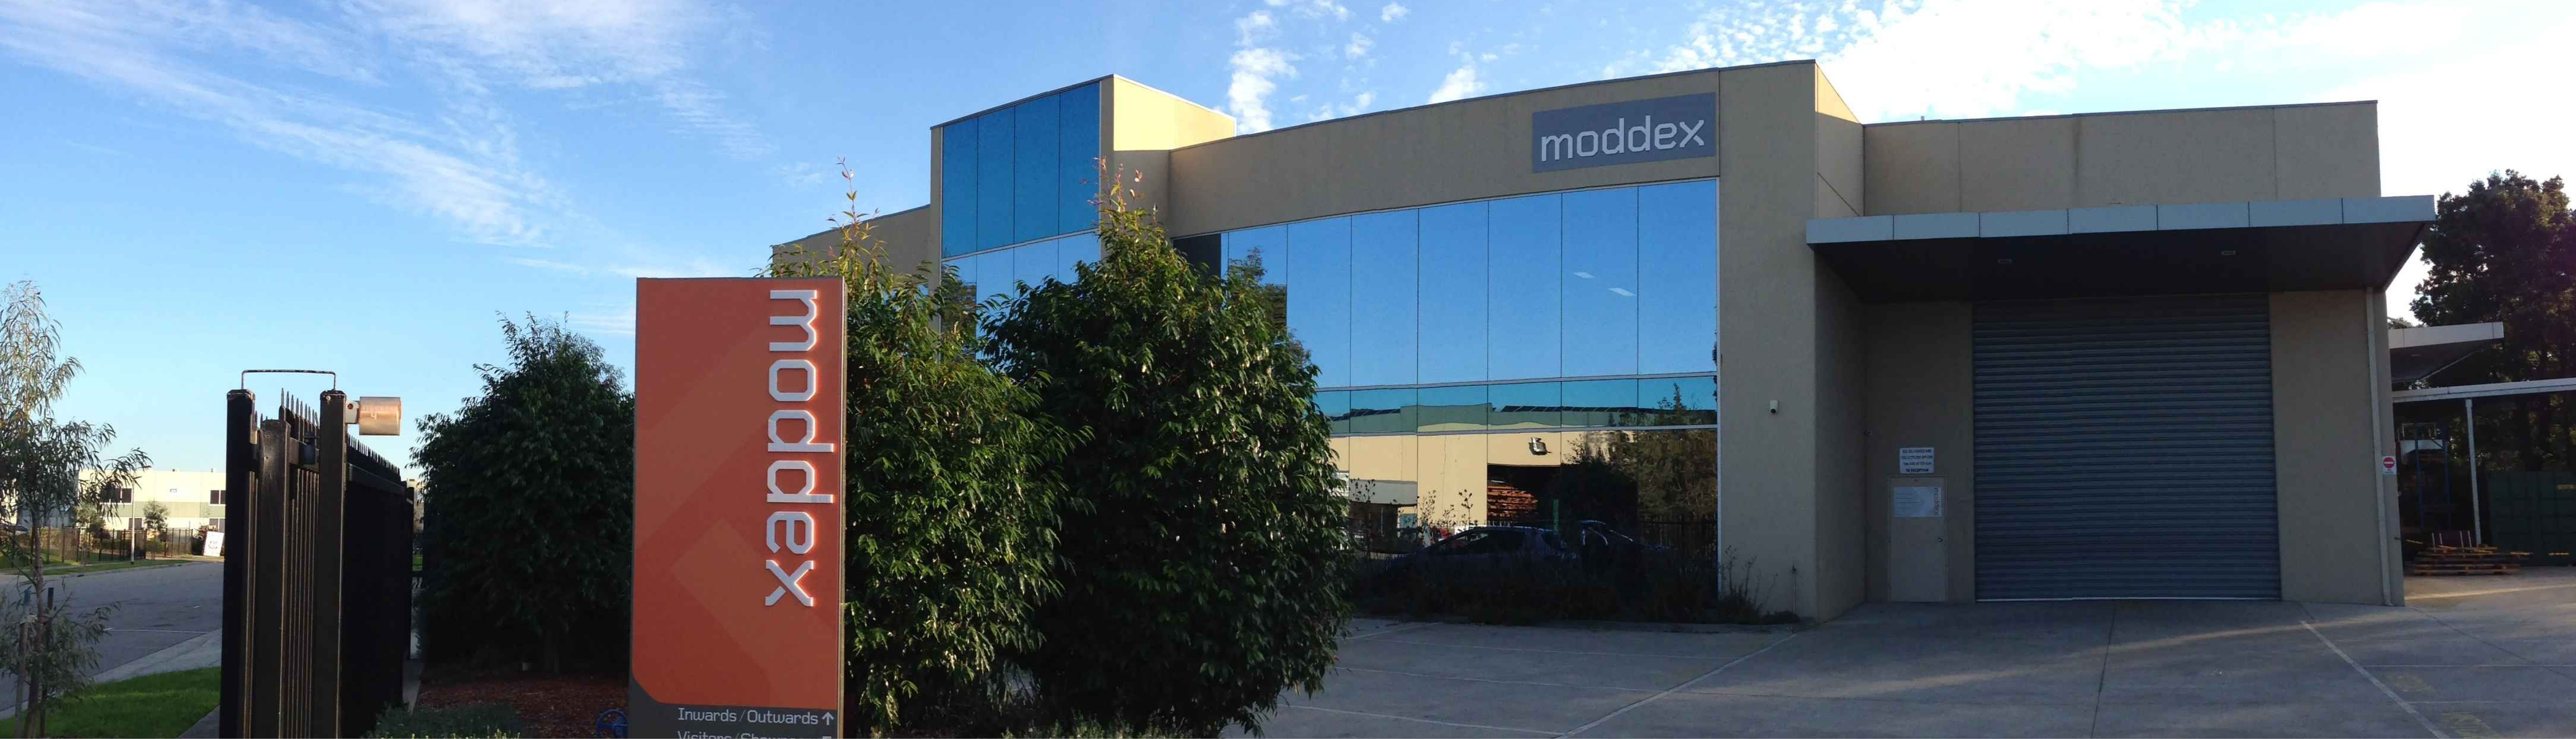 banner moddex head office